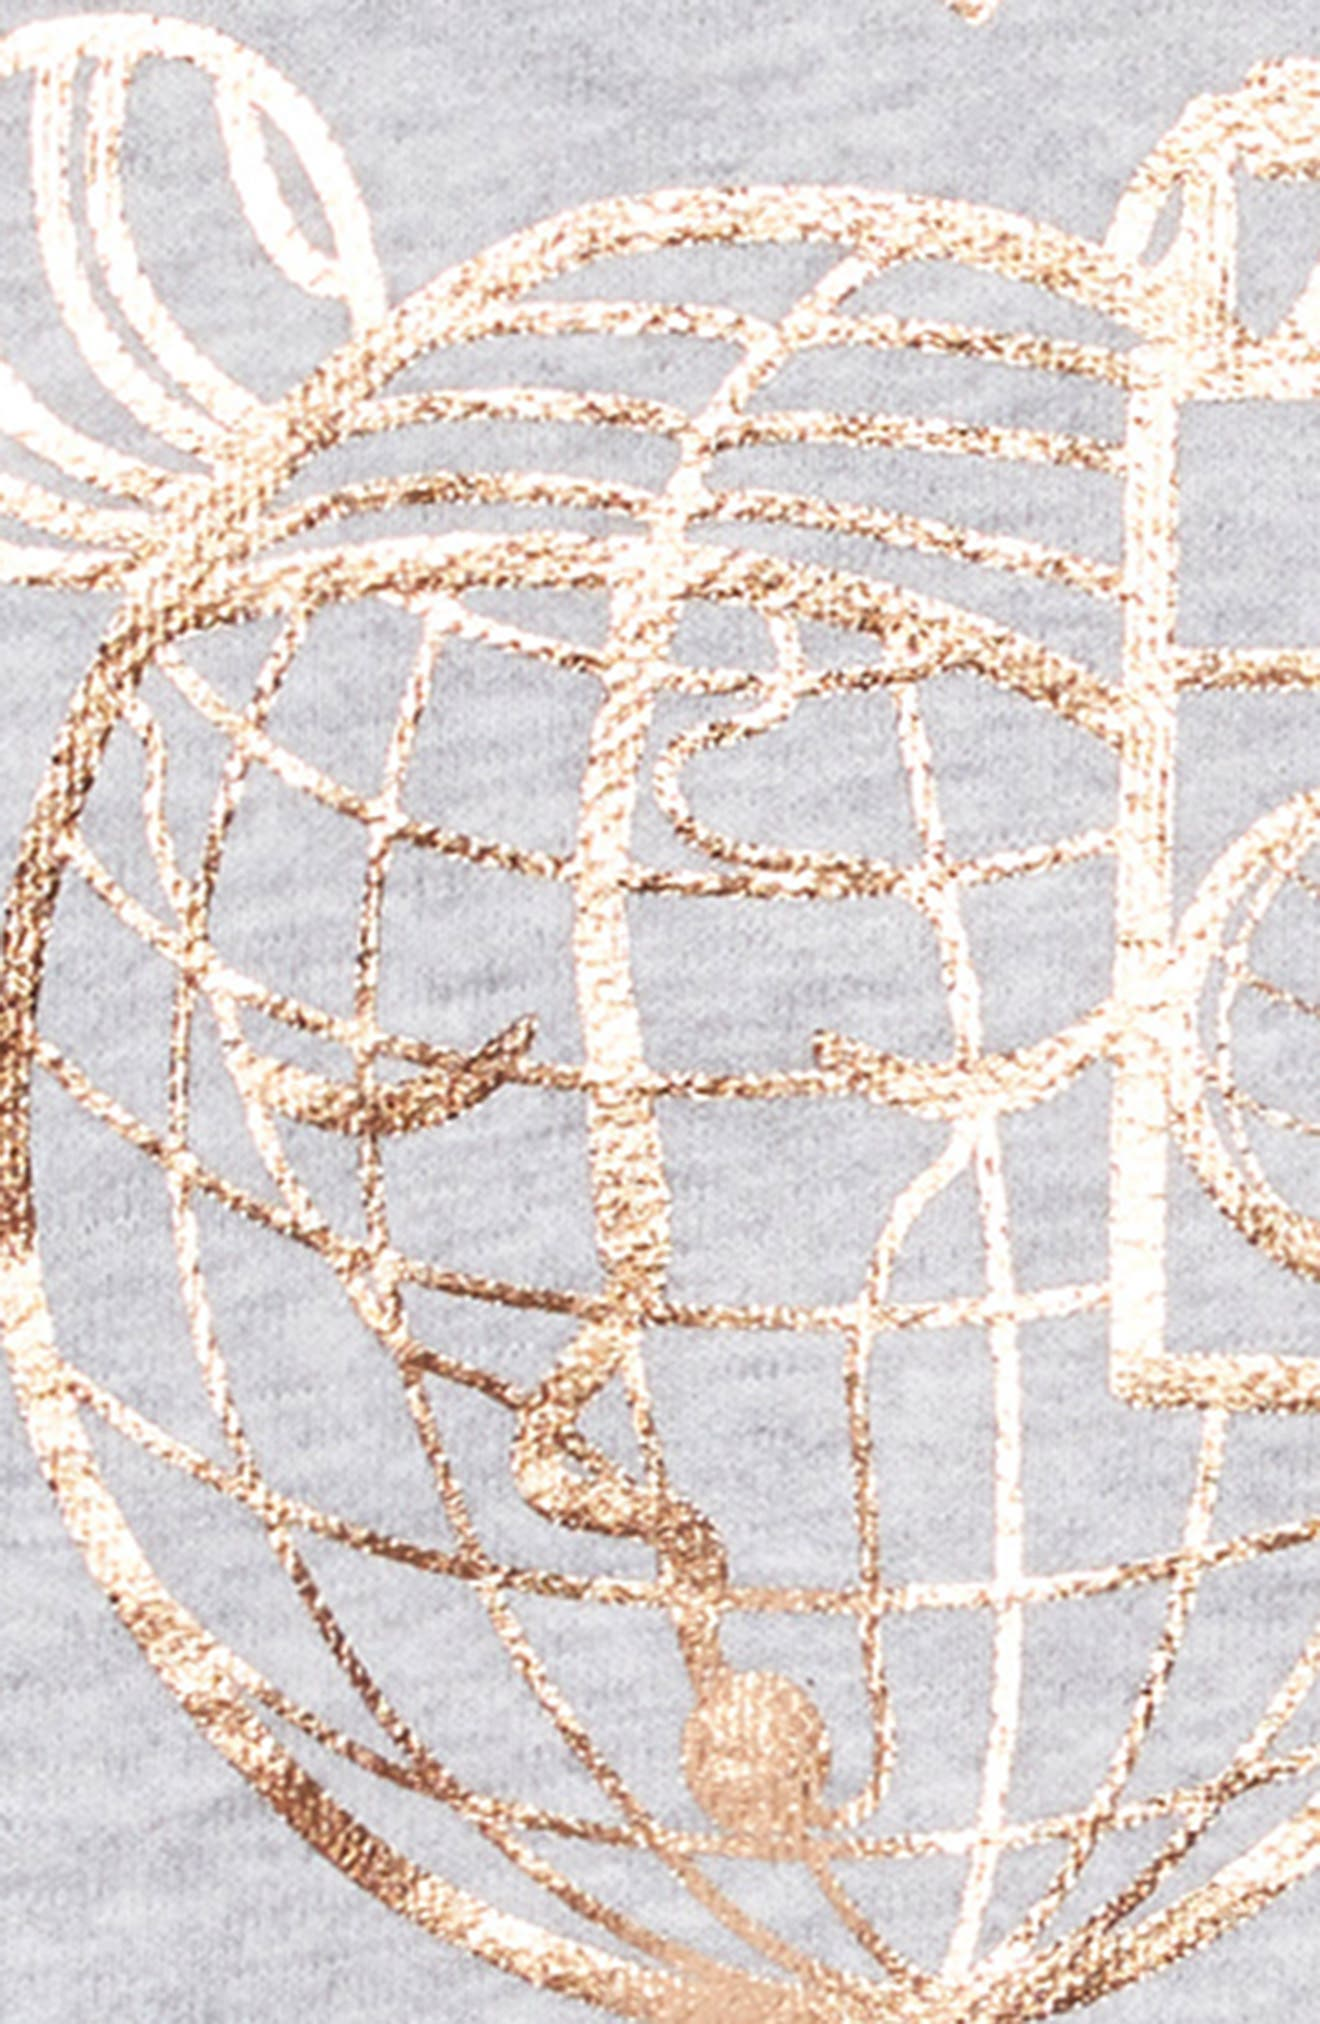 KENZO, Metallic Graphic Sweatshirt & Dress Set, Alternate thumbnail 4, color, COPPER